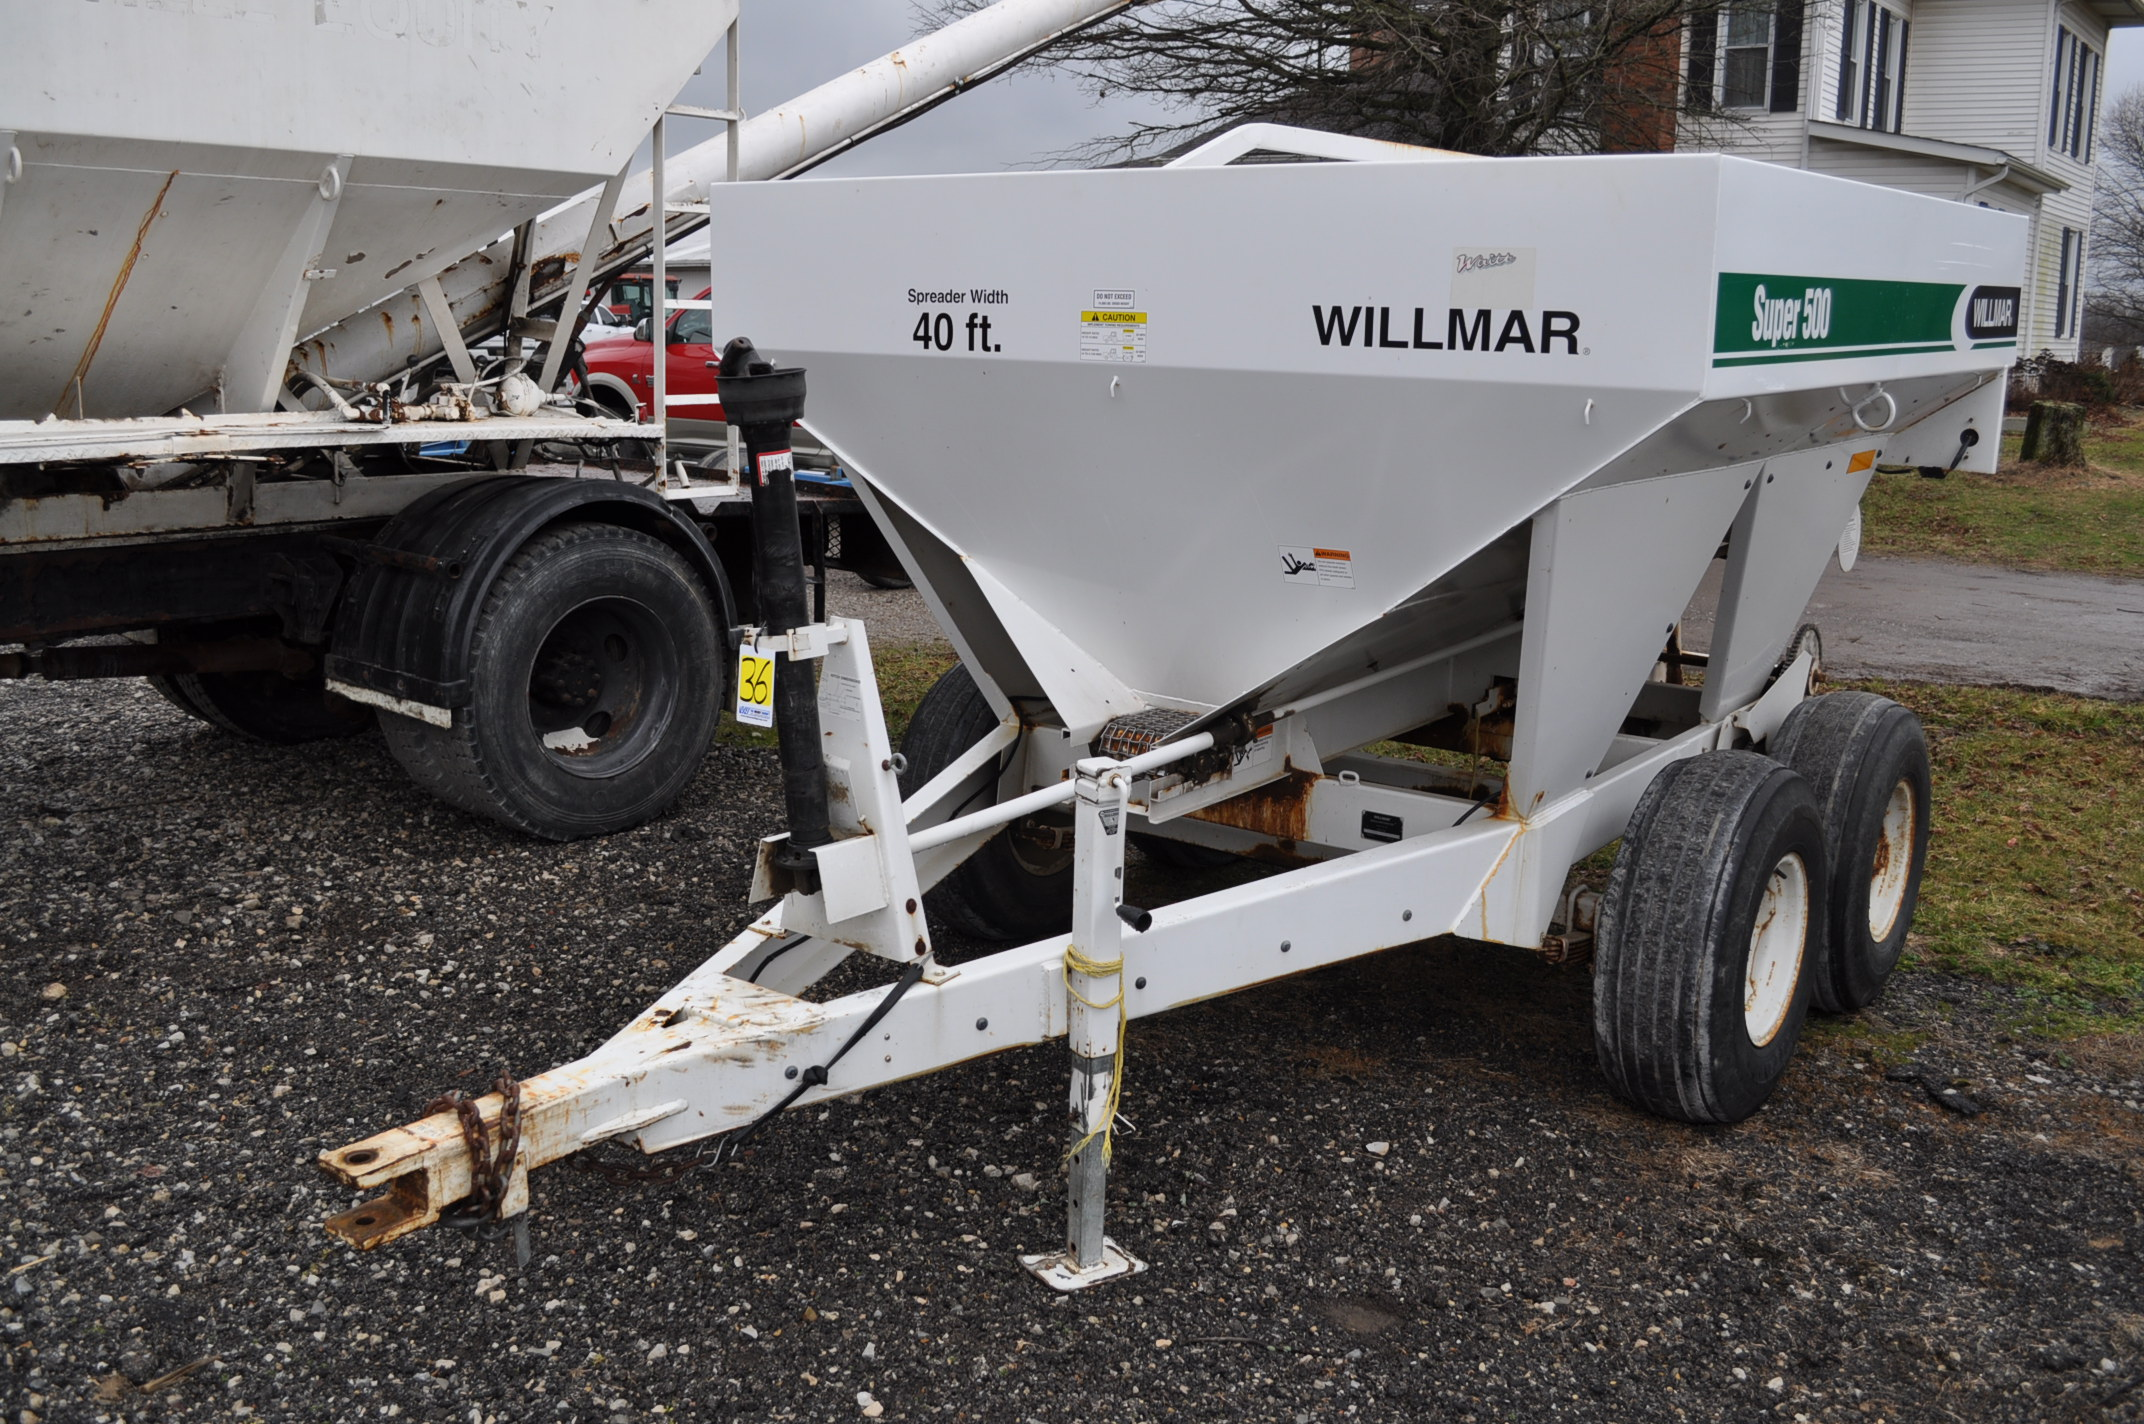 Wilmar Super 500 dry fertilizer spreaders, tandem axles, 12.5L-15 tires, twin spreaders, 540 pto